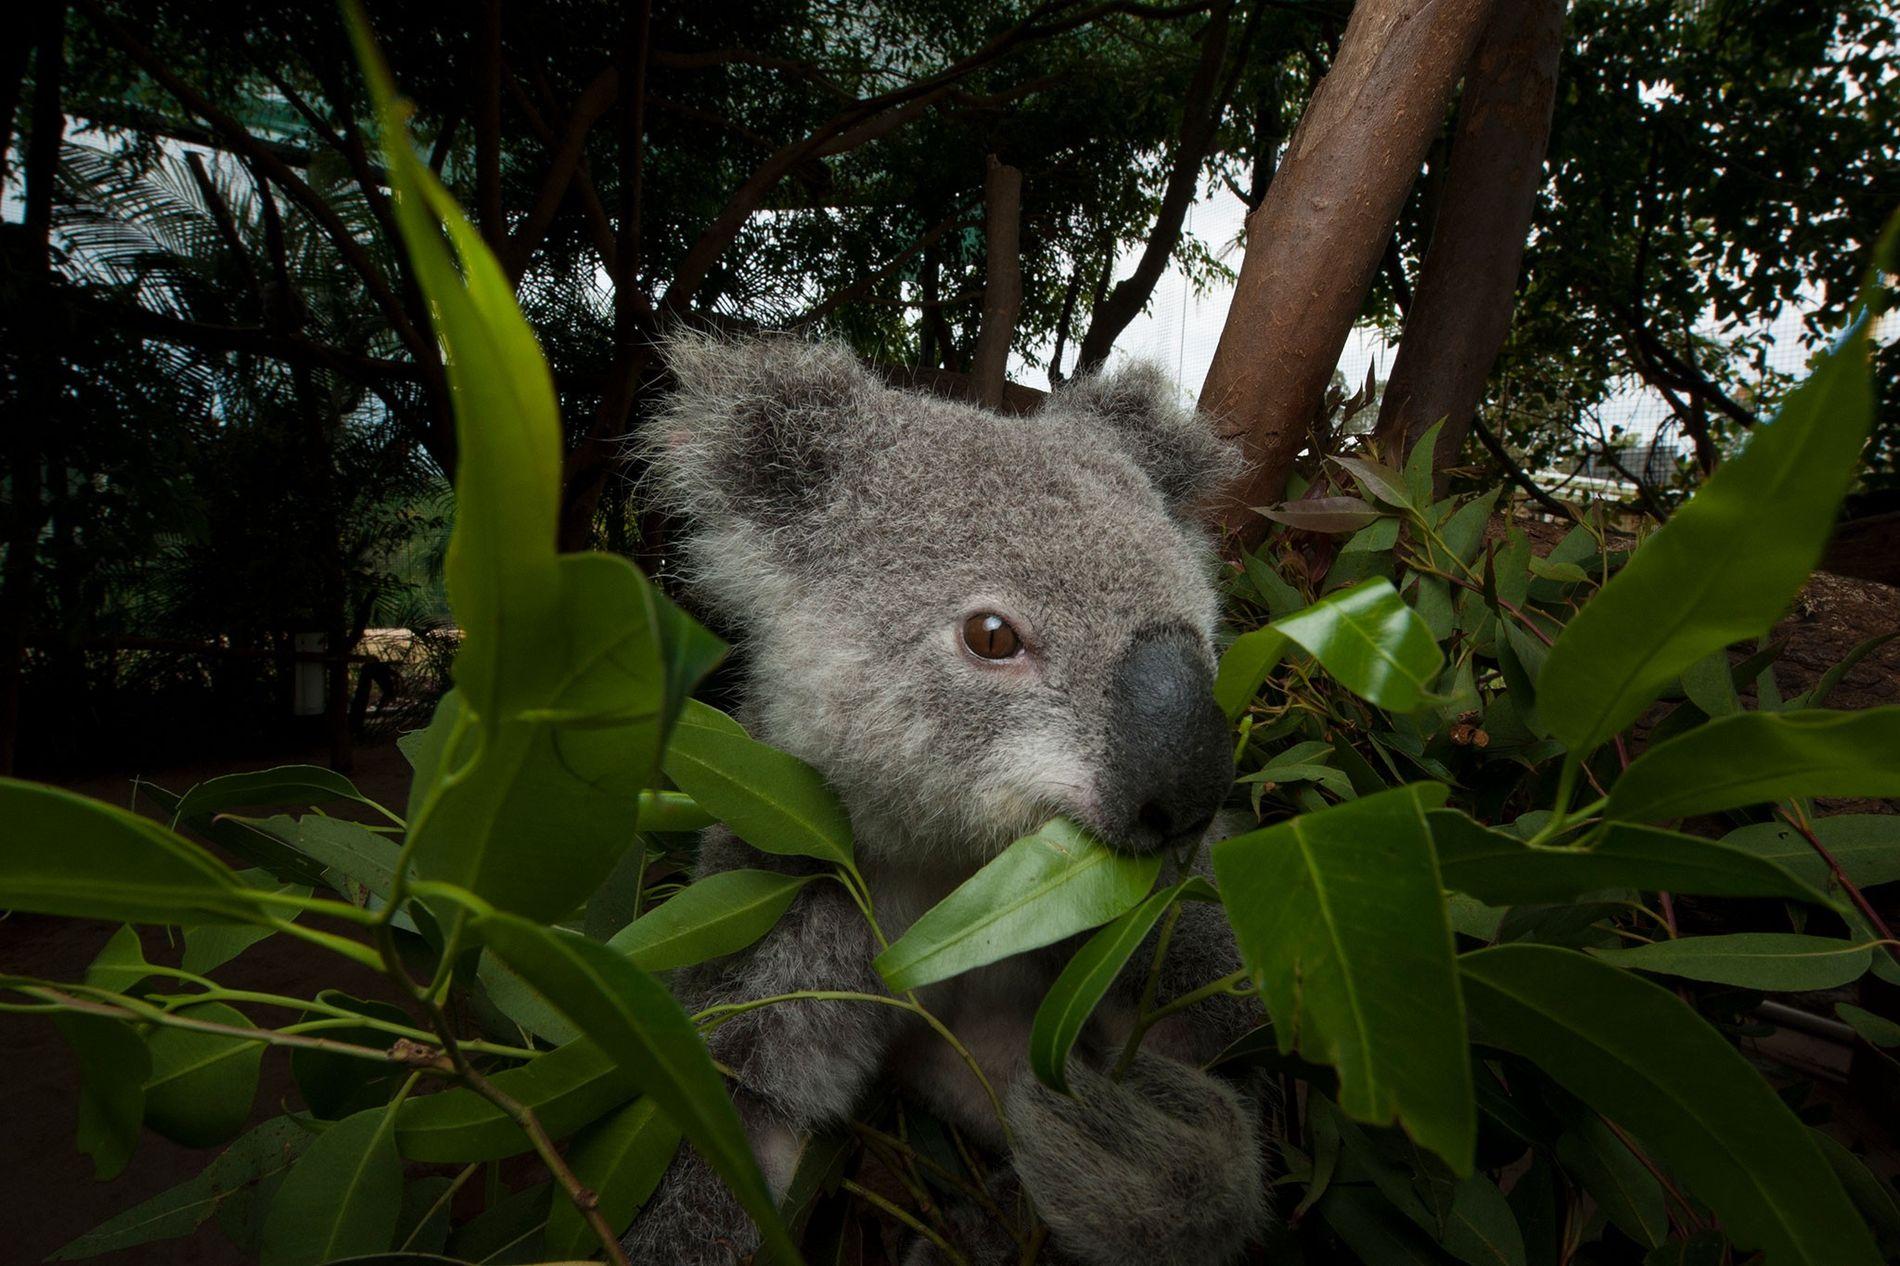 A federally threatened koala eats eucalyptus leaves at an animal hospital. Beerwah, Queensland, Australia.